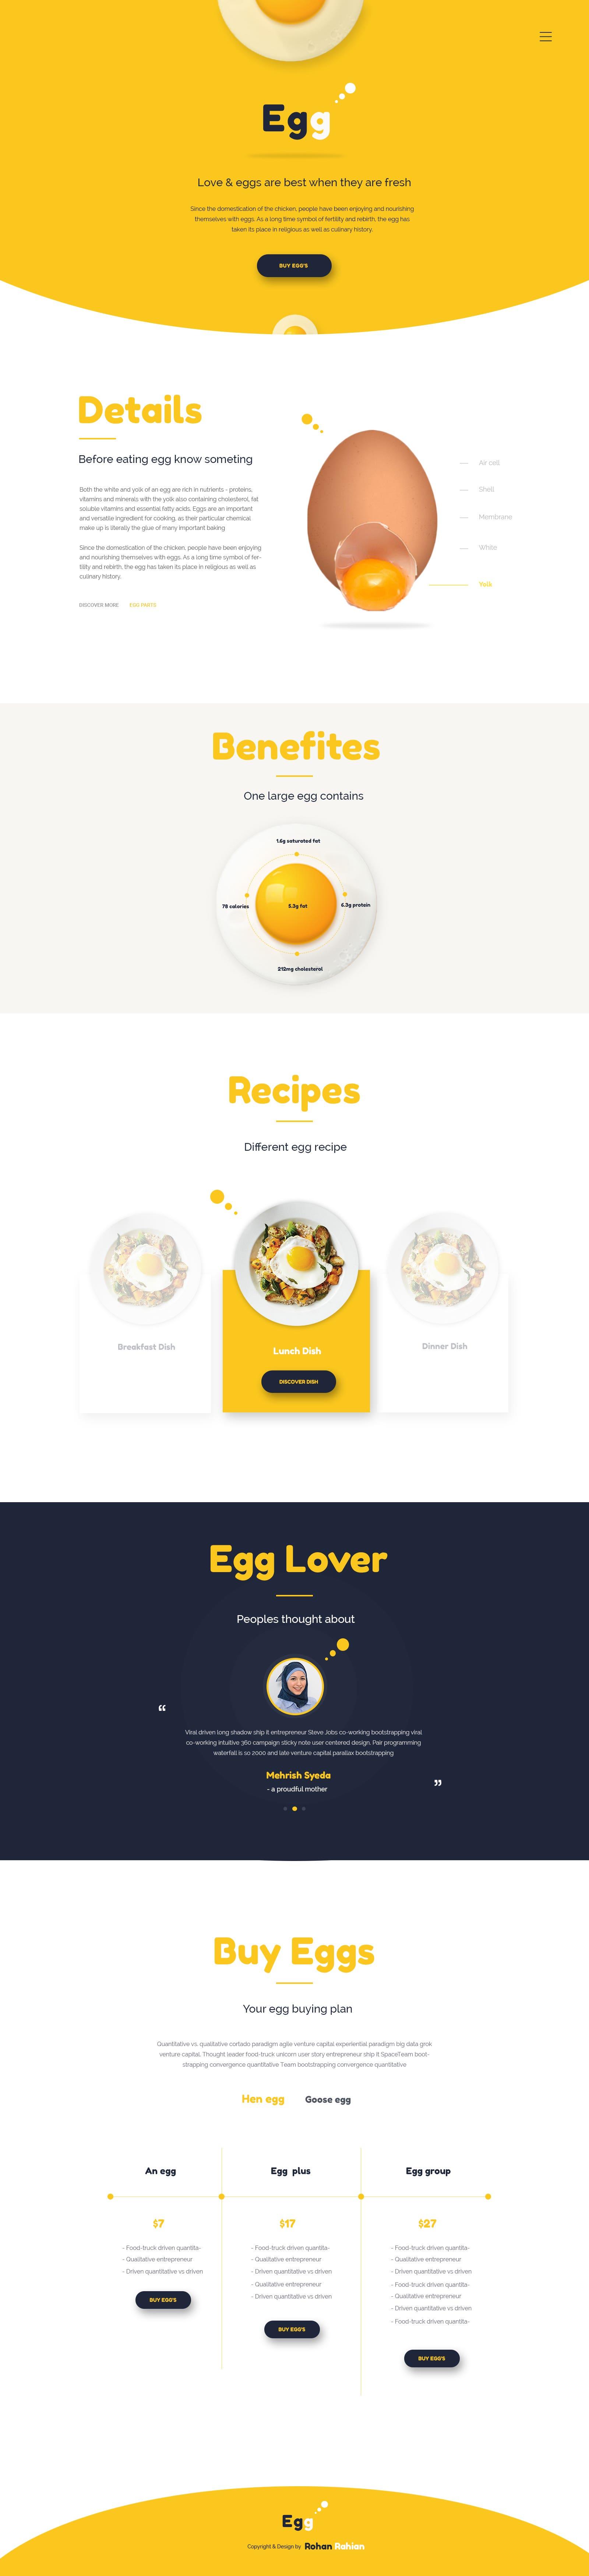 Egg- product design concet